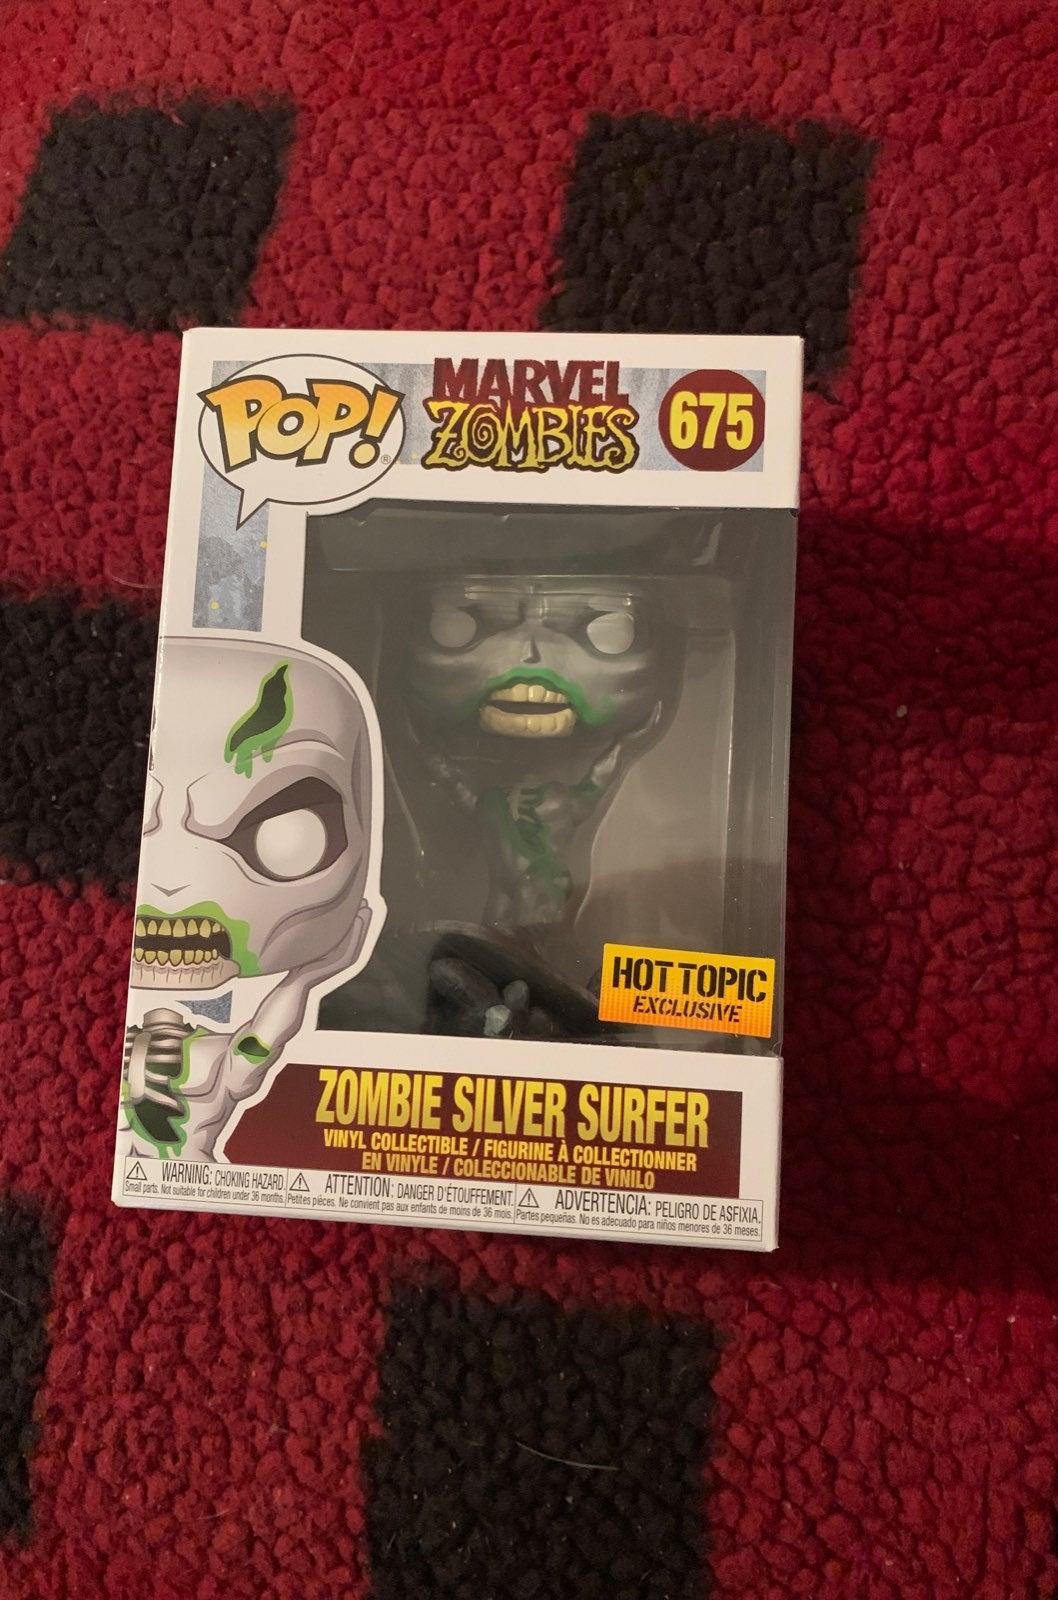 Zombie Silver Surfer